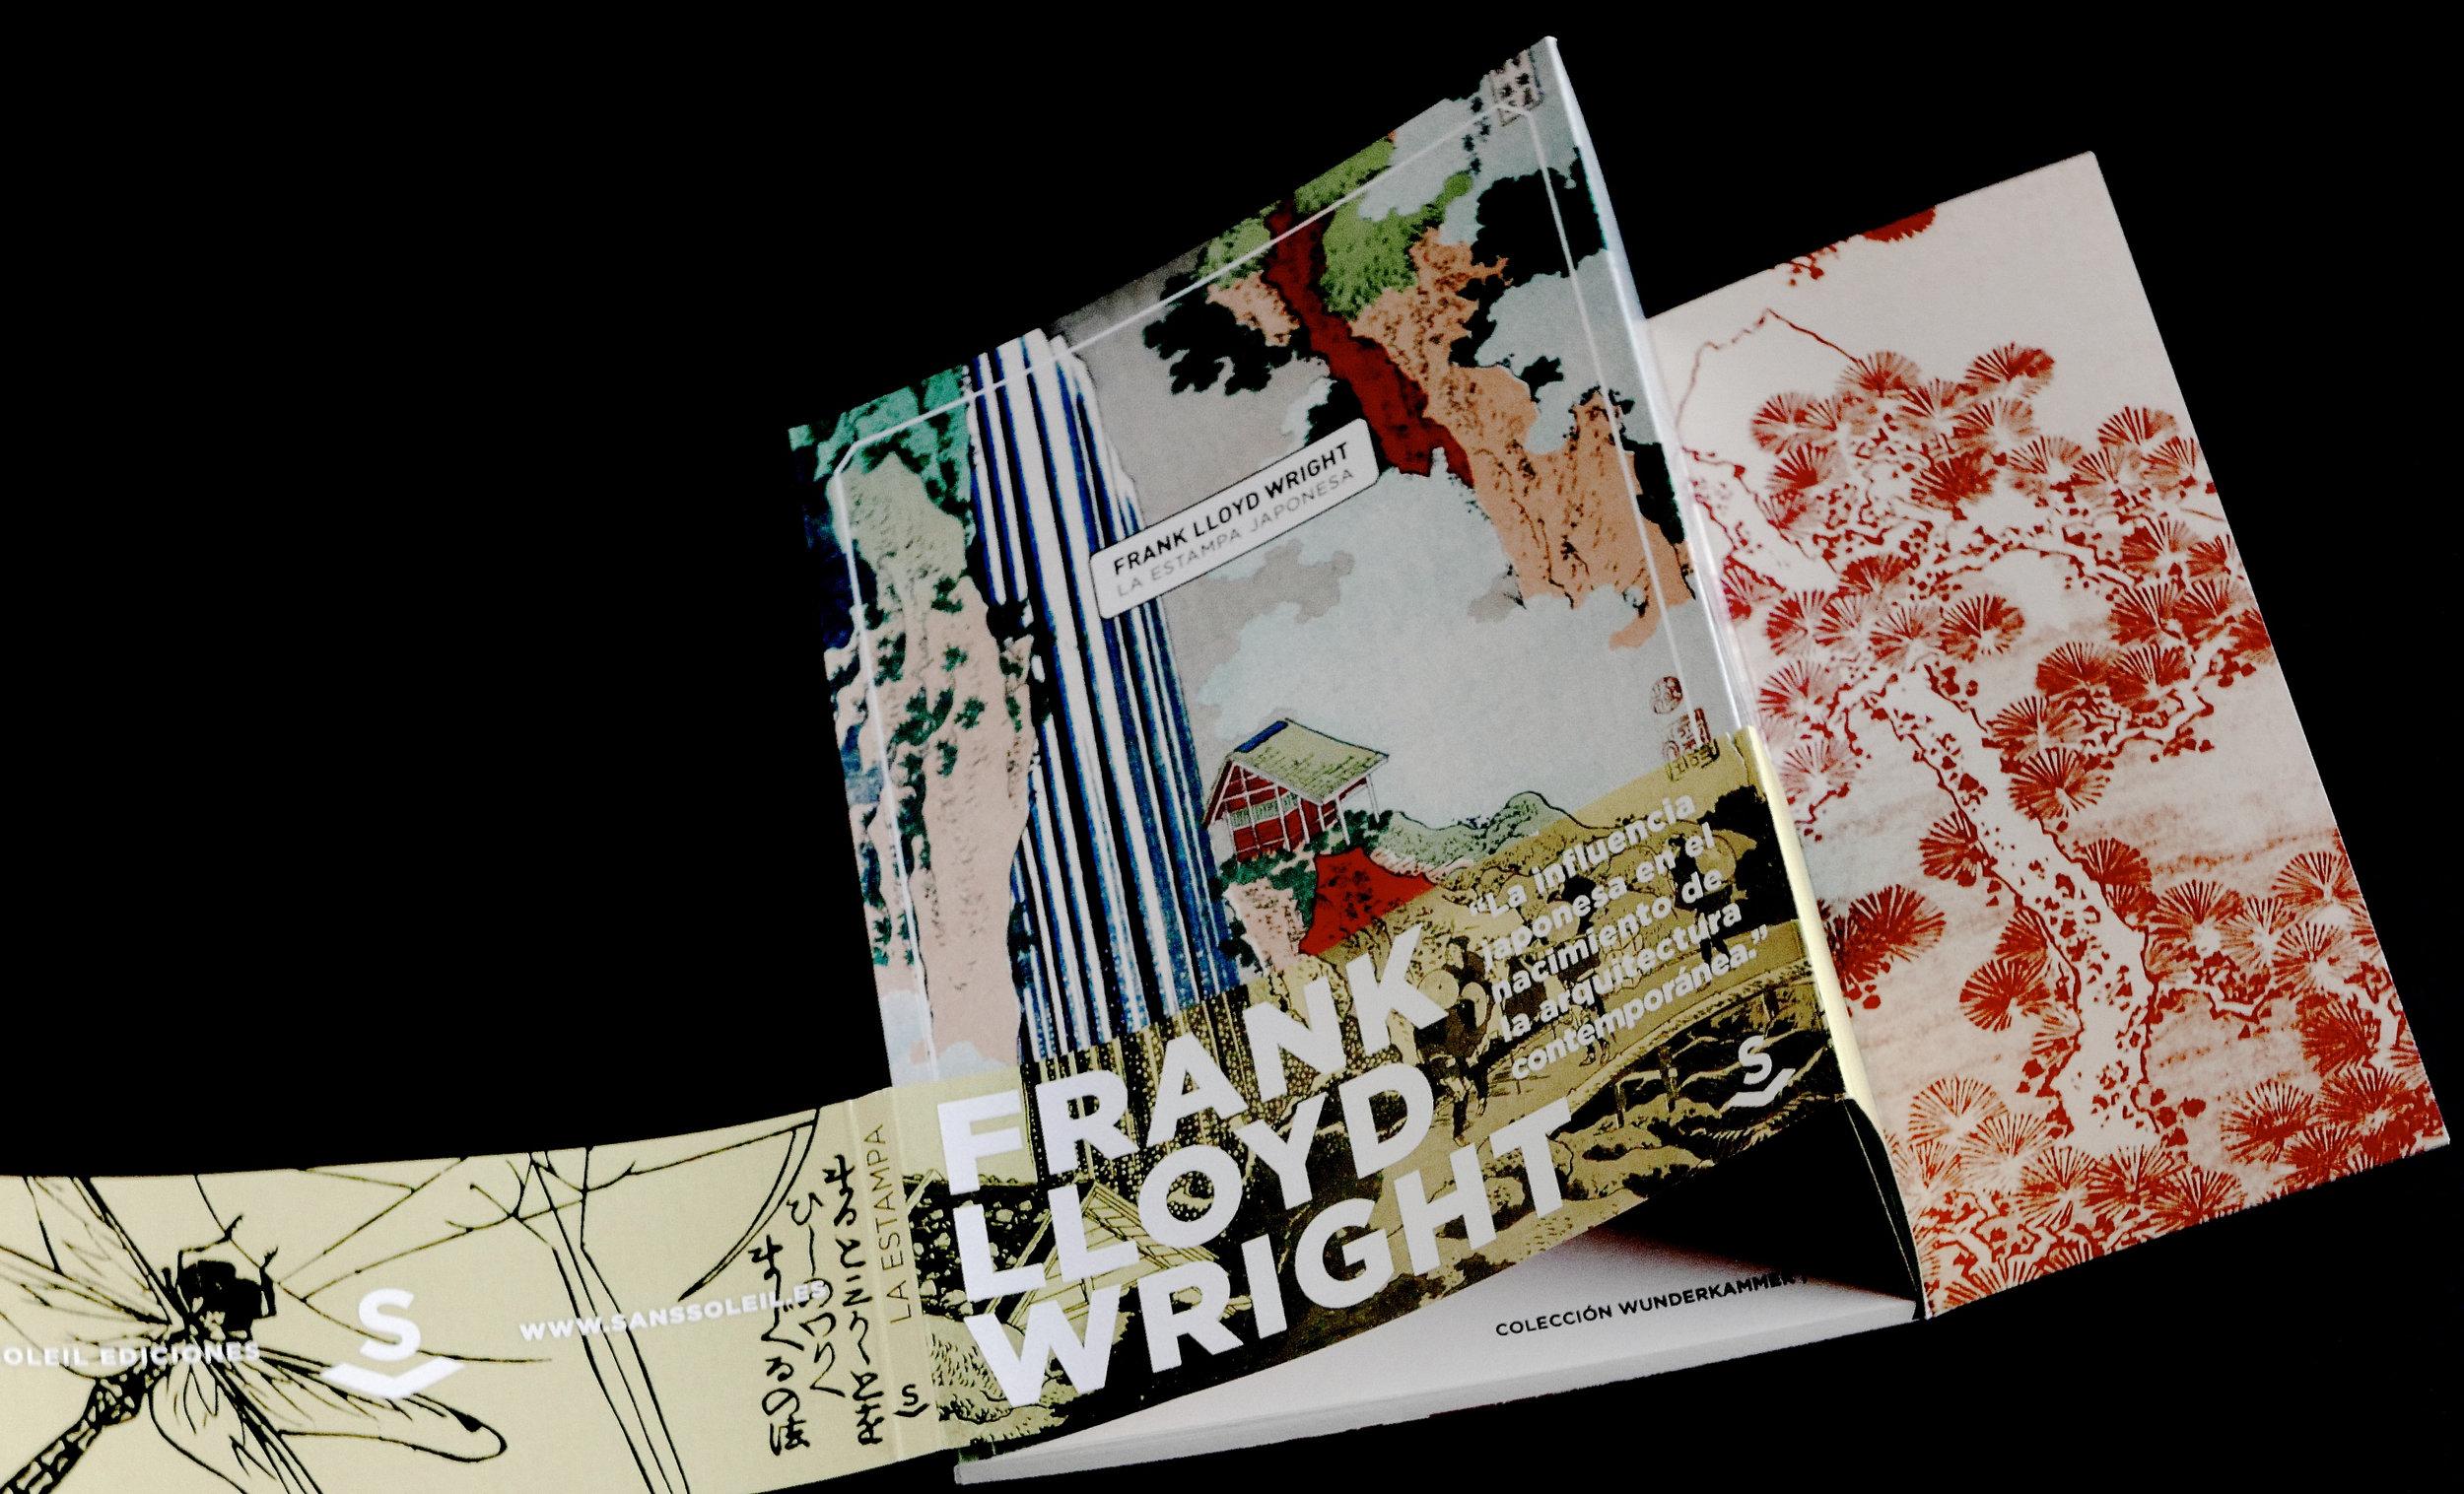 Frank Lloyd Wright Sanssoleil - color